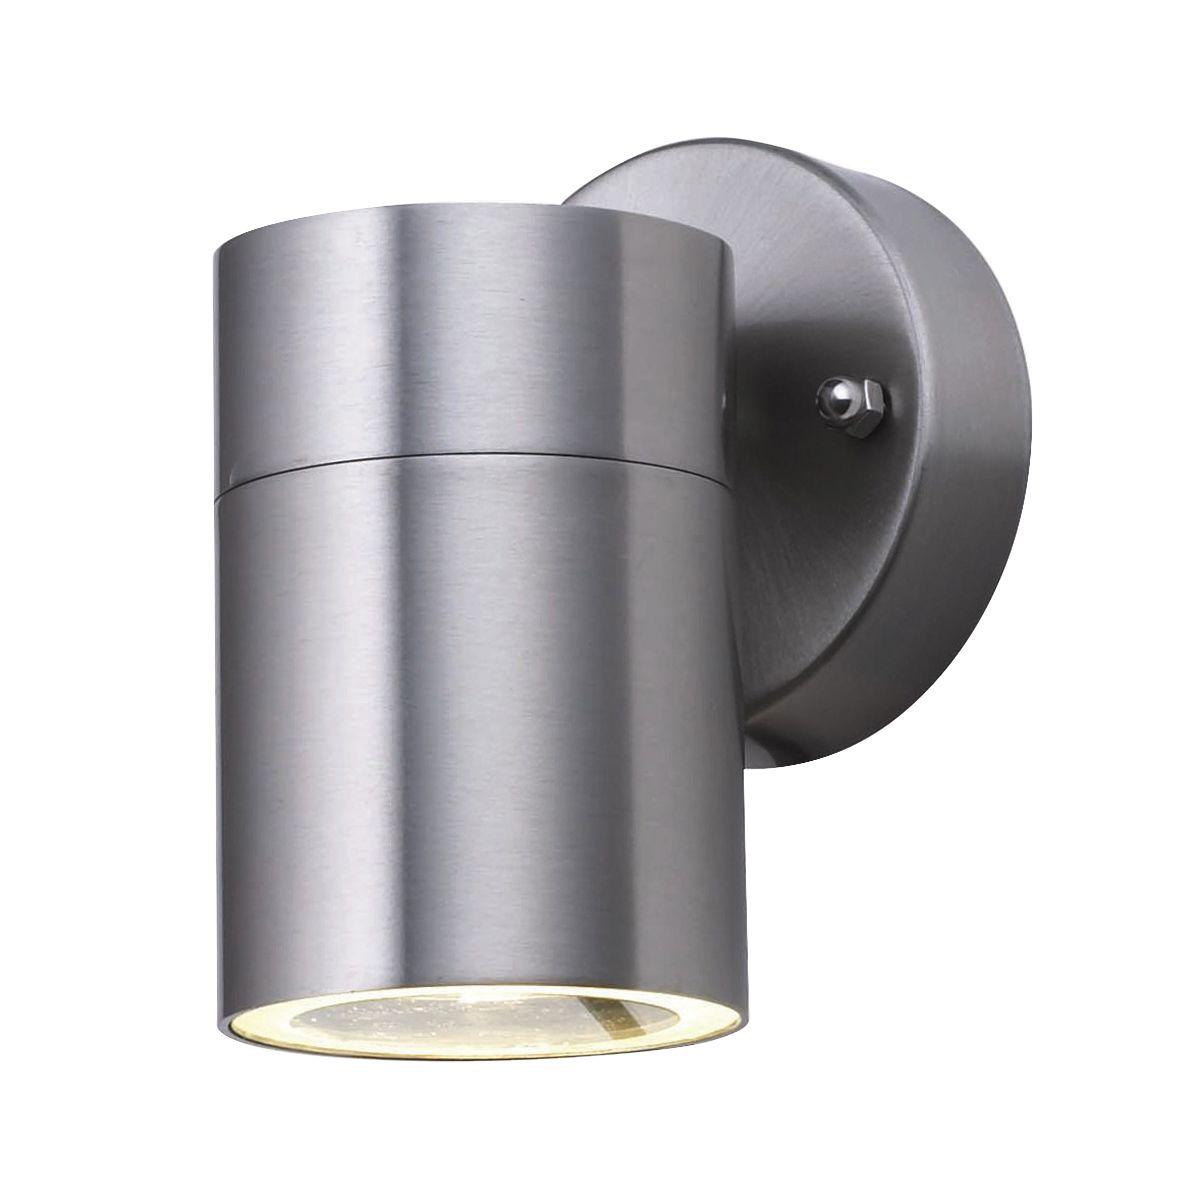 Led Stainless Steel Ip44 Outdoor Wall Bracket Tube Light